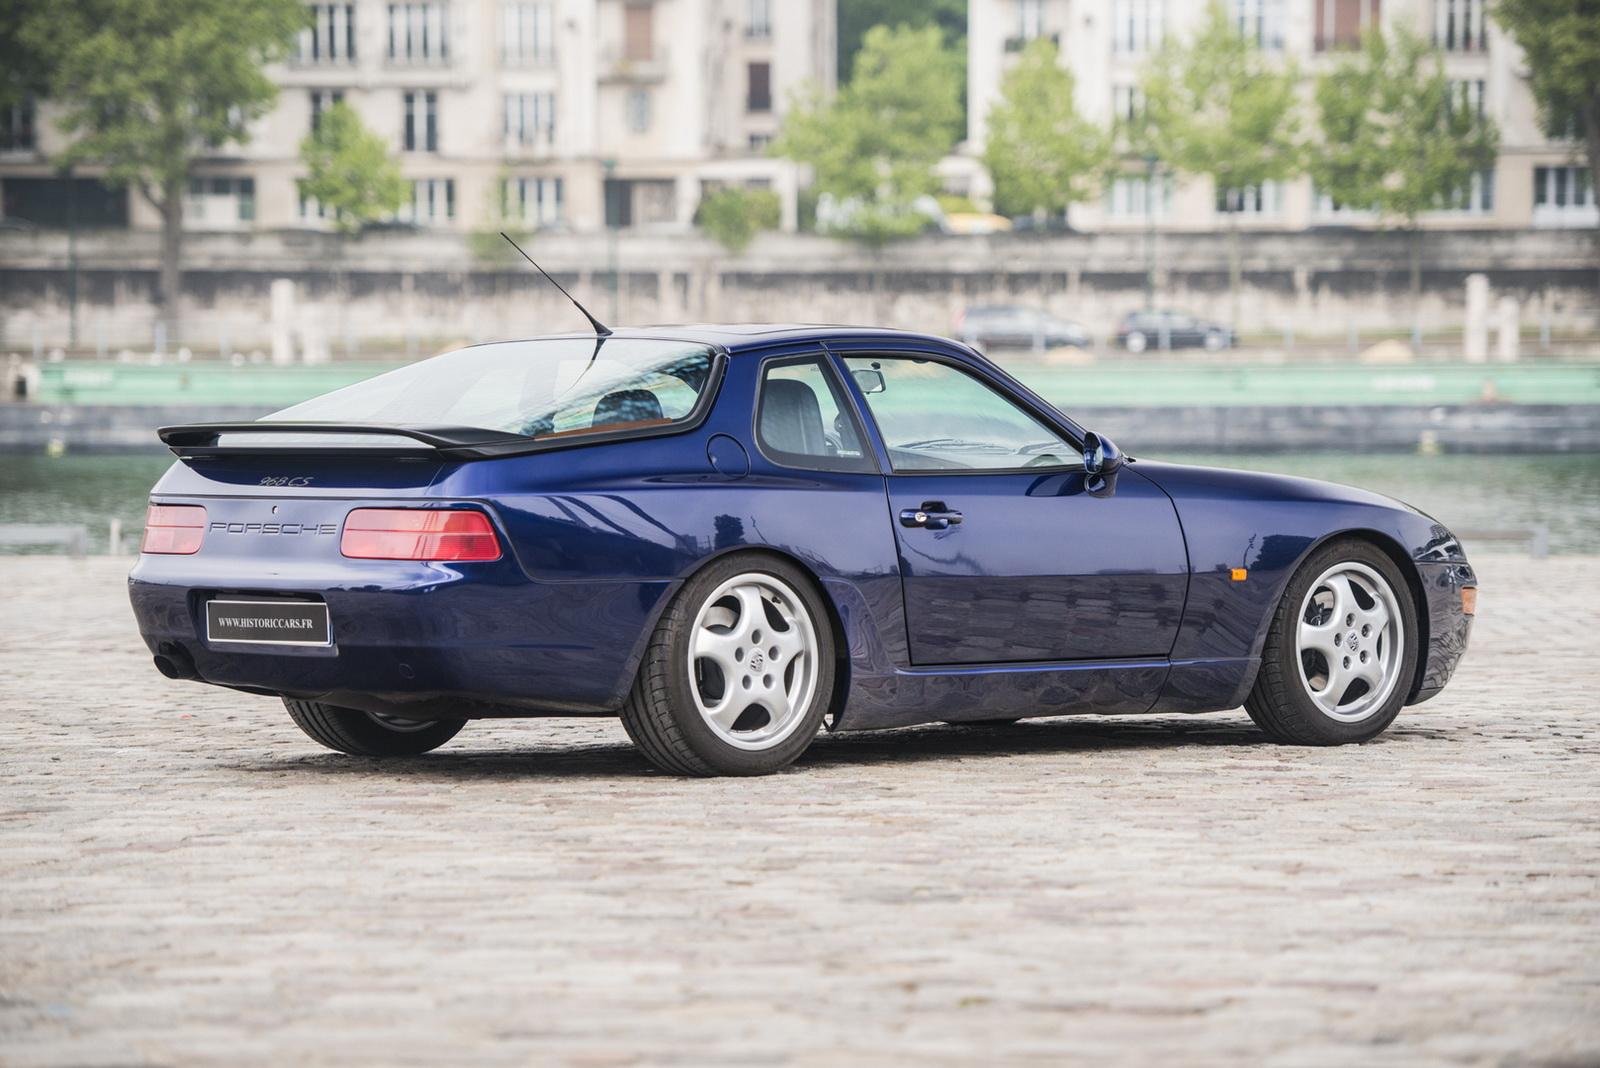 This Porsche 968 Club Sport Is A Forgotten Gem Looking For A New ...